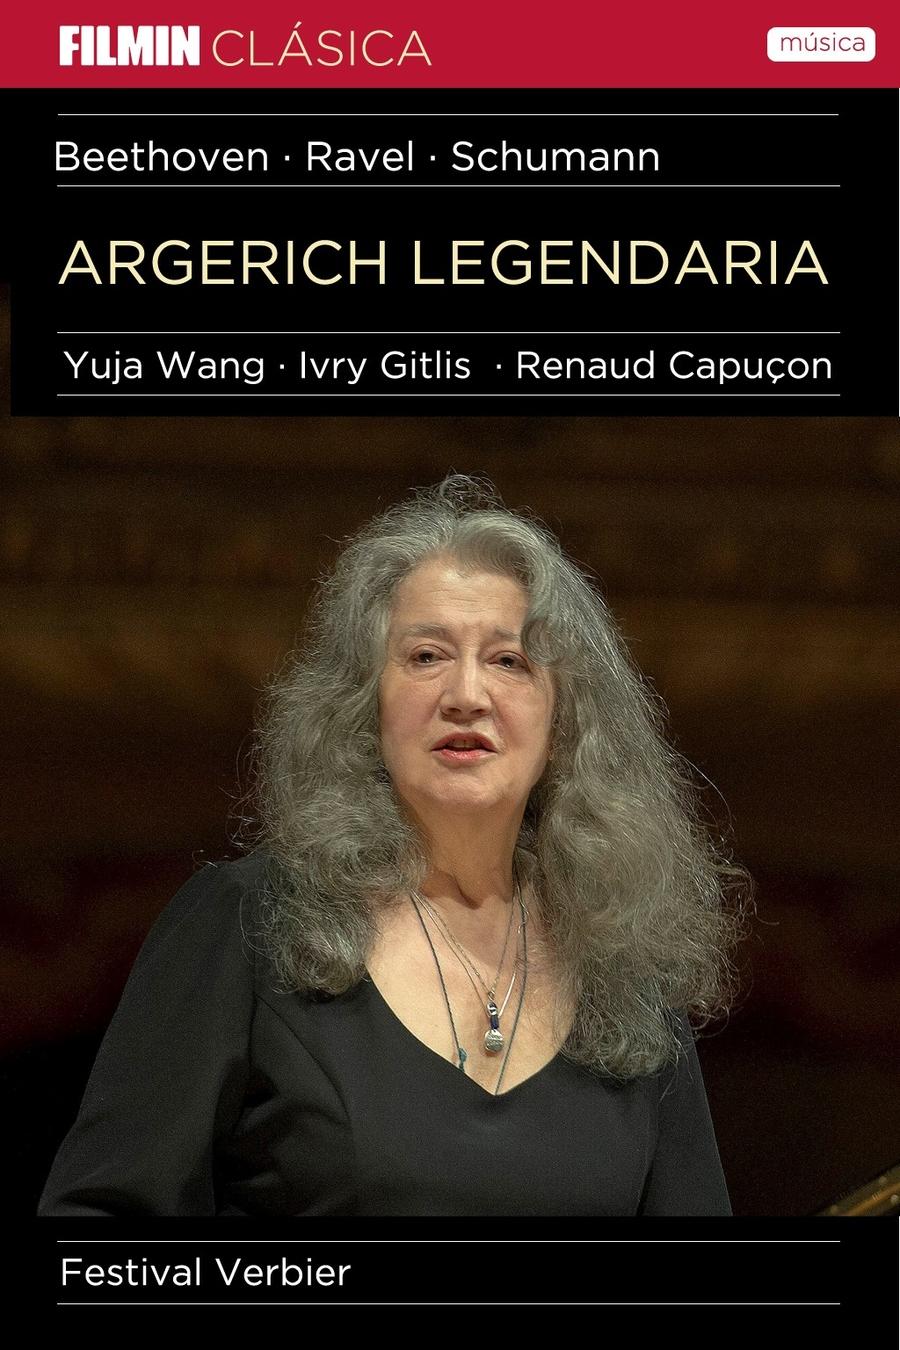 Argerich Legendaria